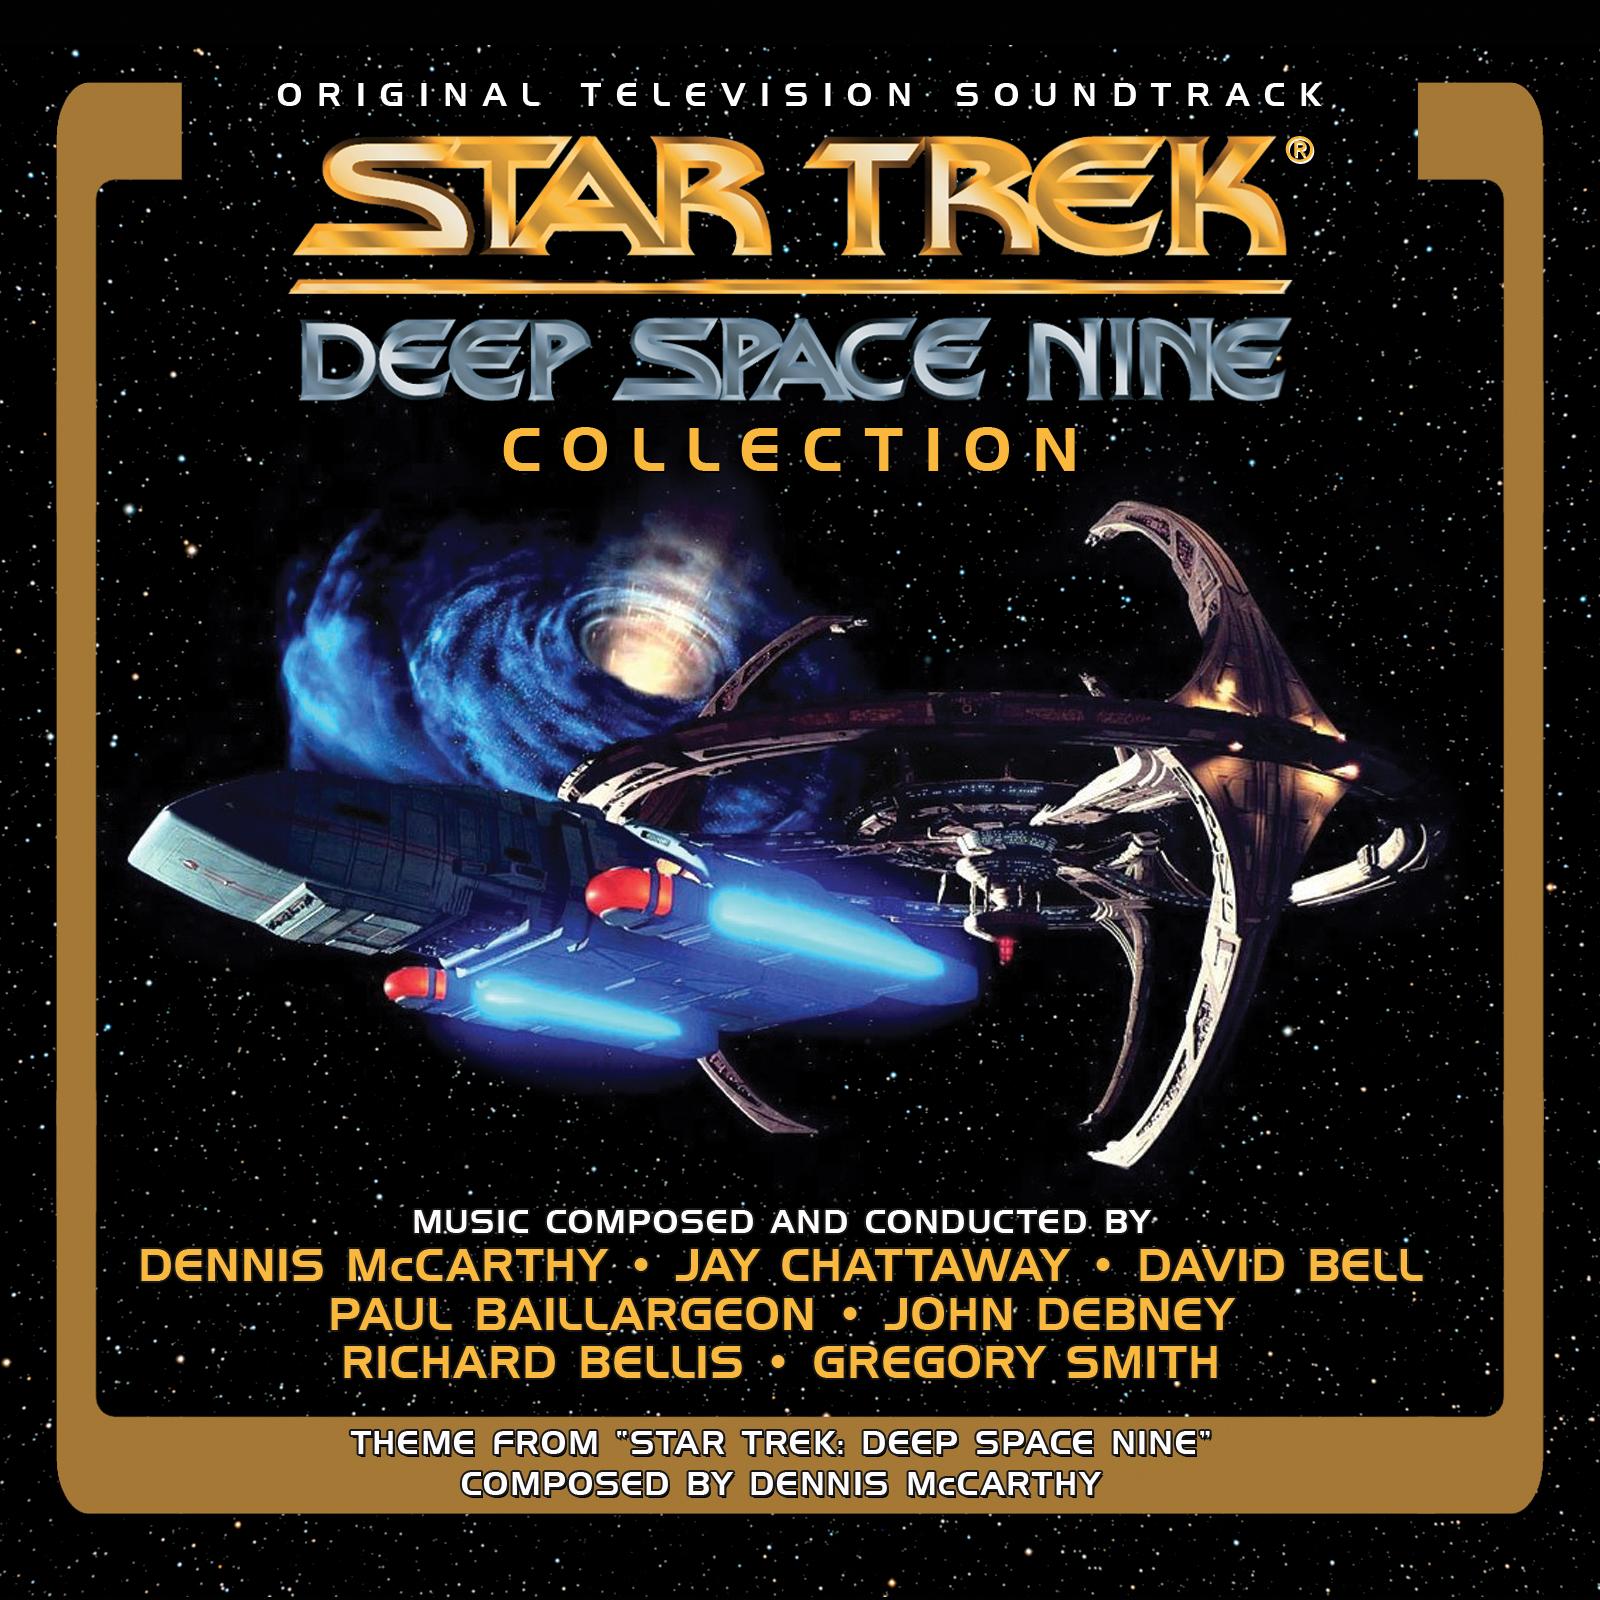 Jay Chattaway - Star Trek: The Next Generation (Original Soundtrack Recordings)